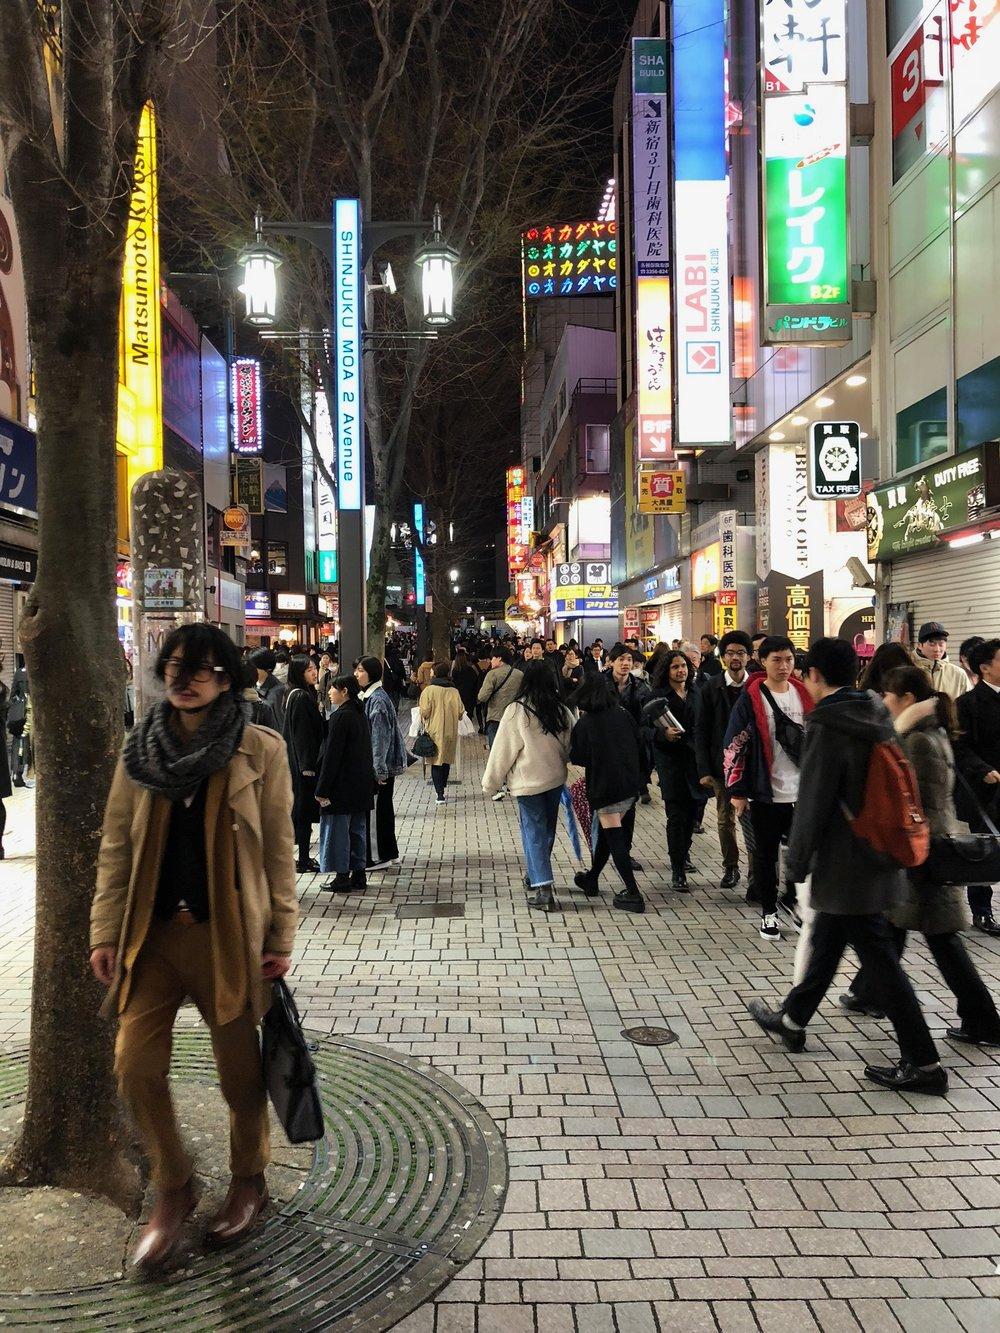 Wandering around Shinjuku at night.